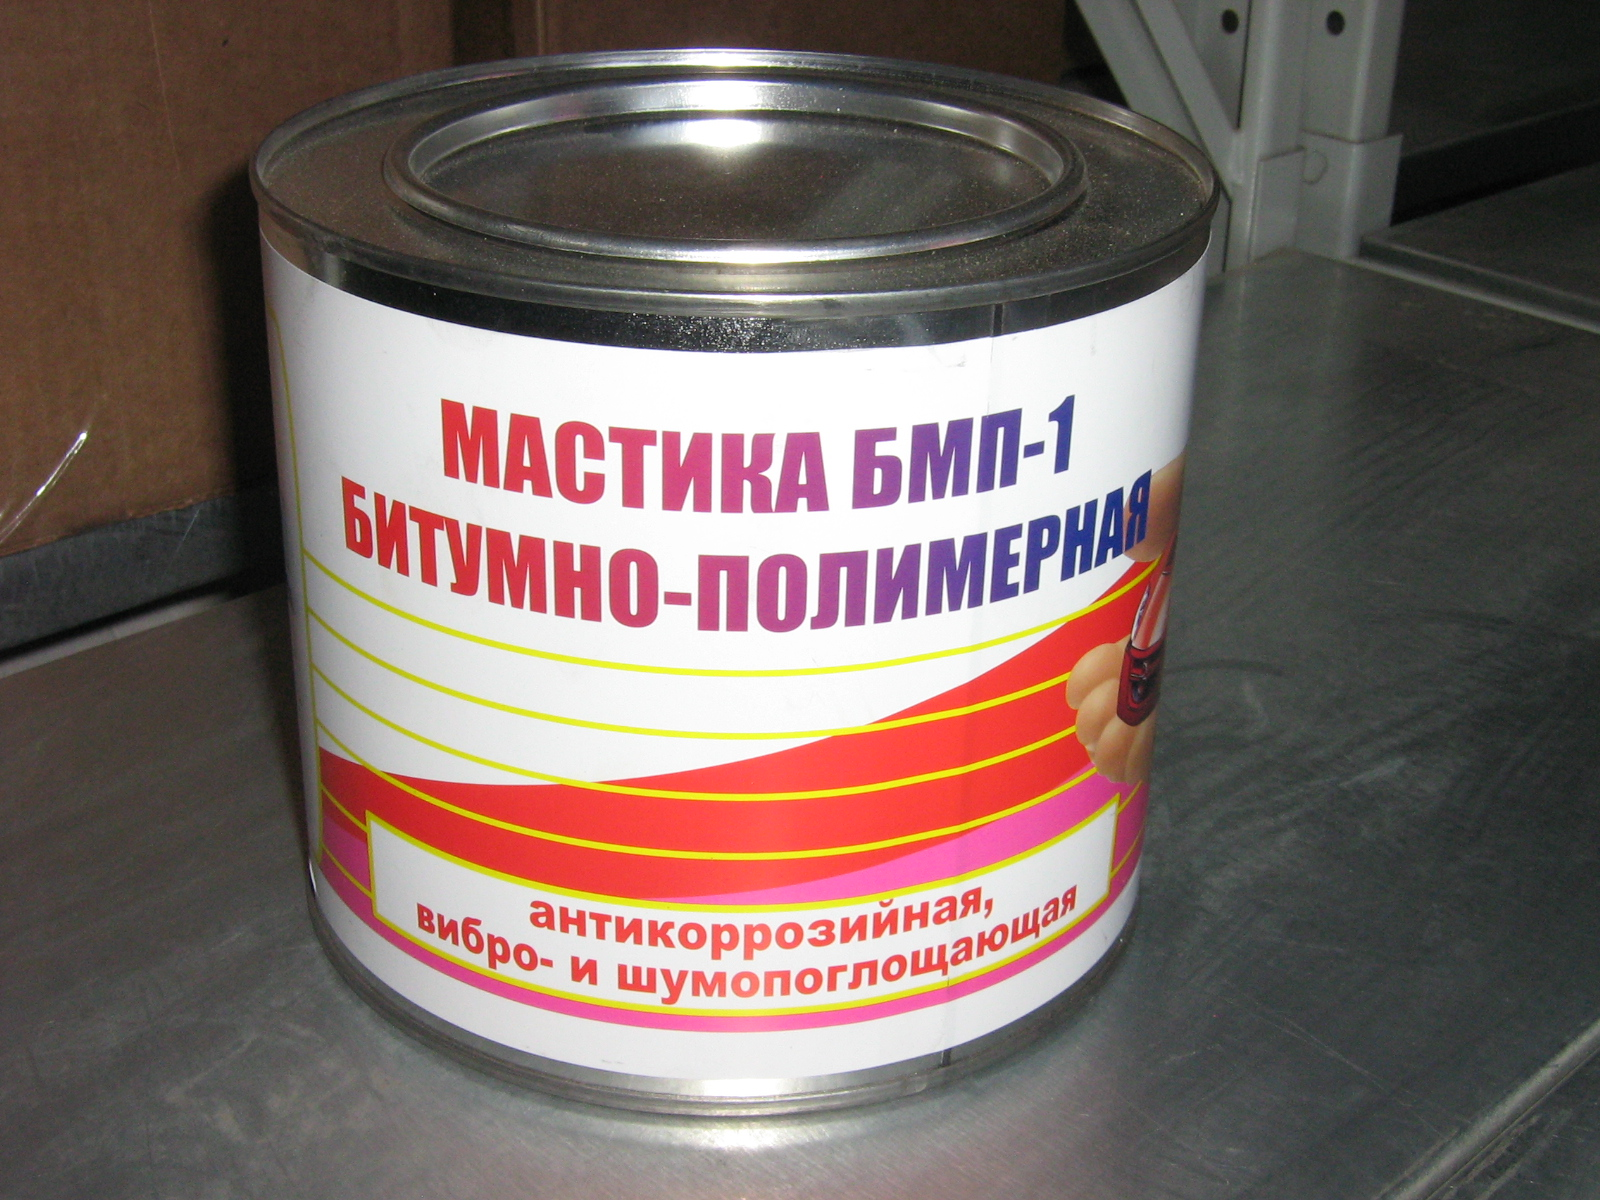 Мастика БМП-1 Бесшумно-каучуковая